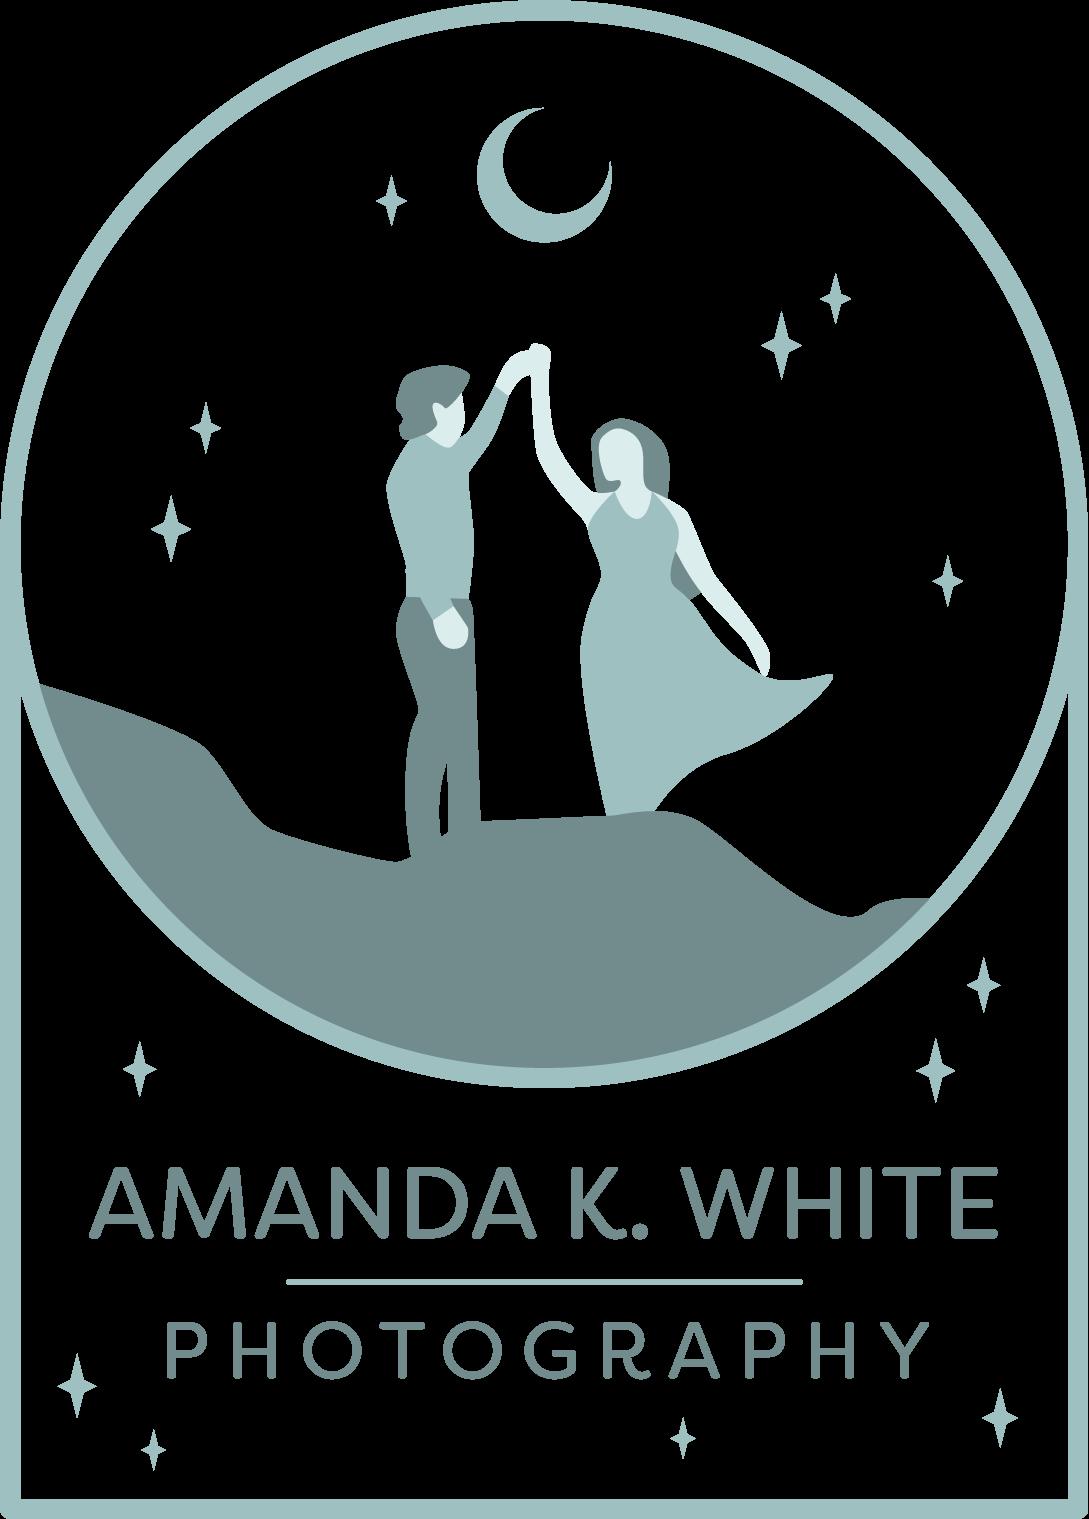 Amanda K. White